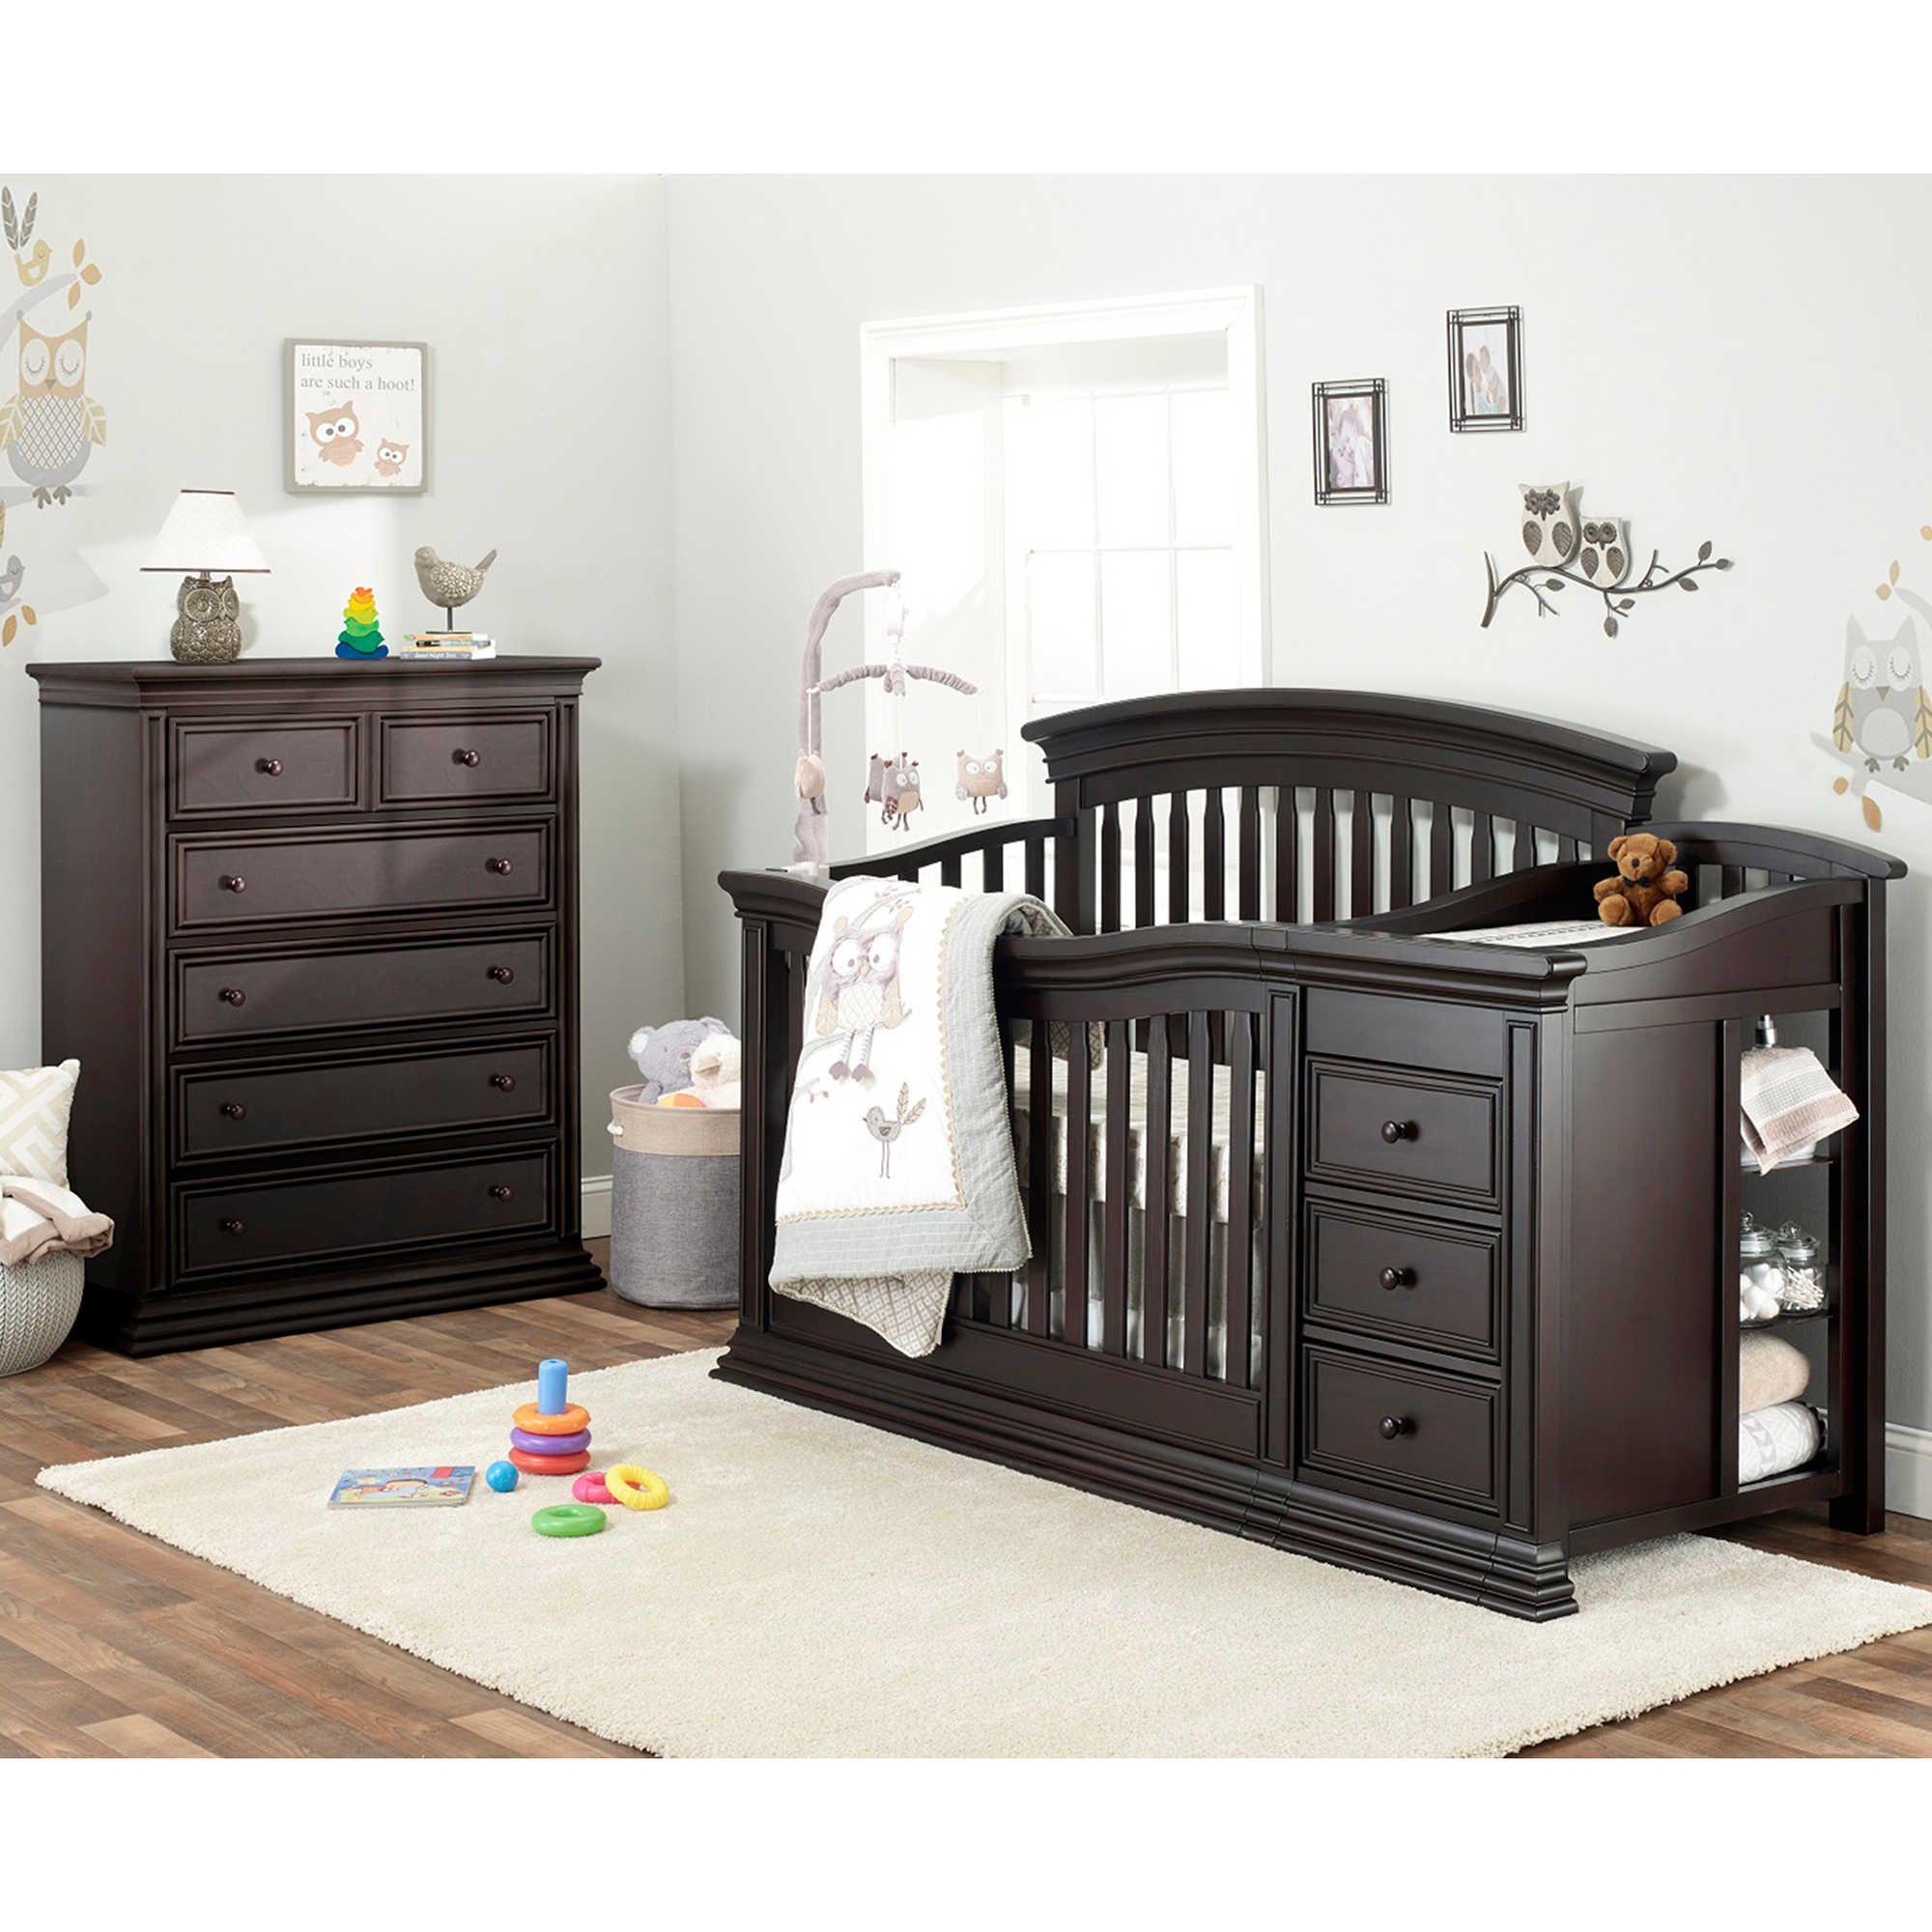 Sorelle Sedona Nursery Furniture Collection In Espresso Nursery